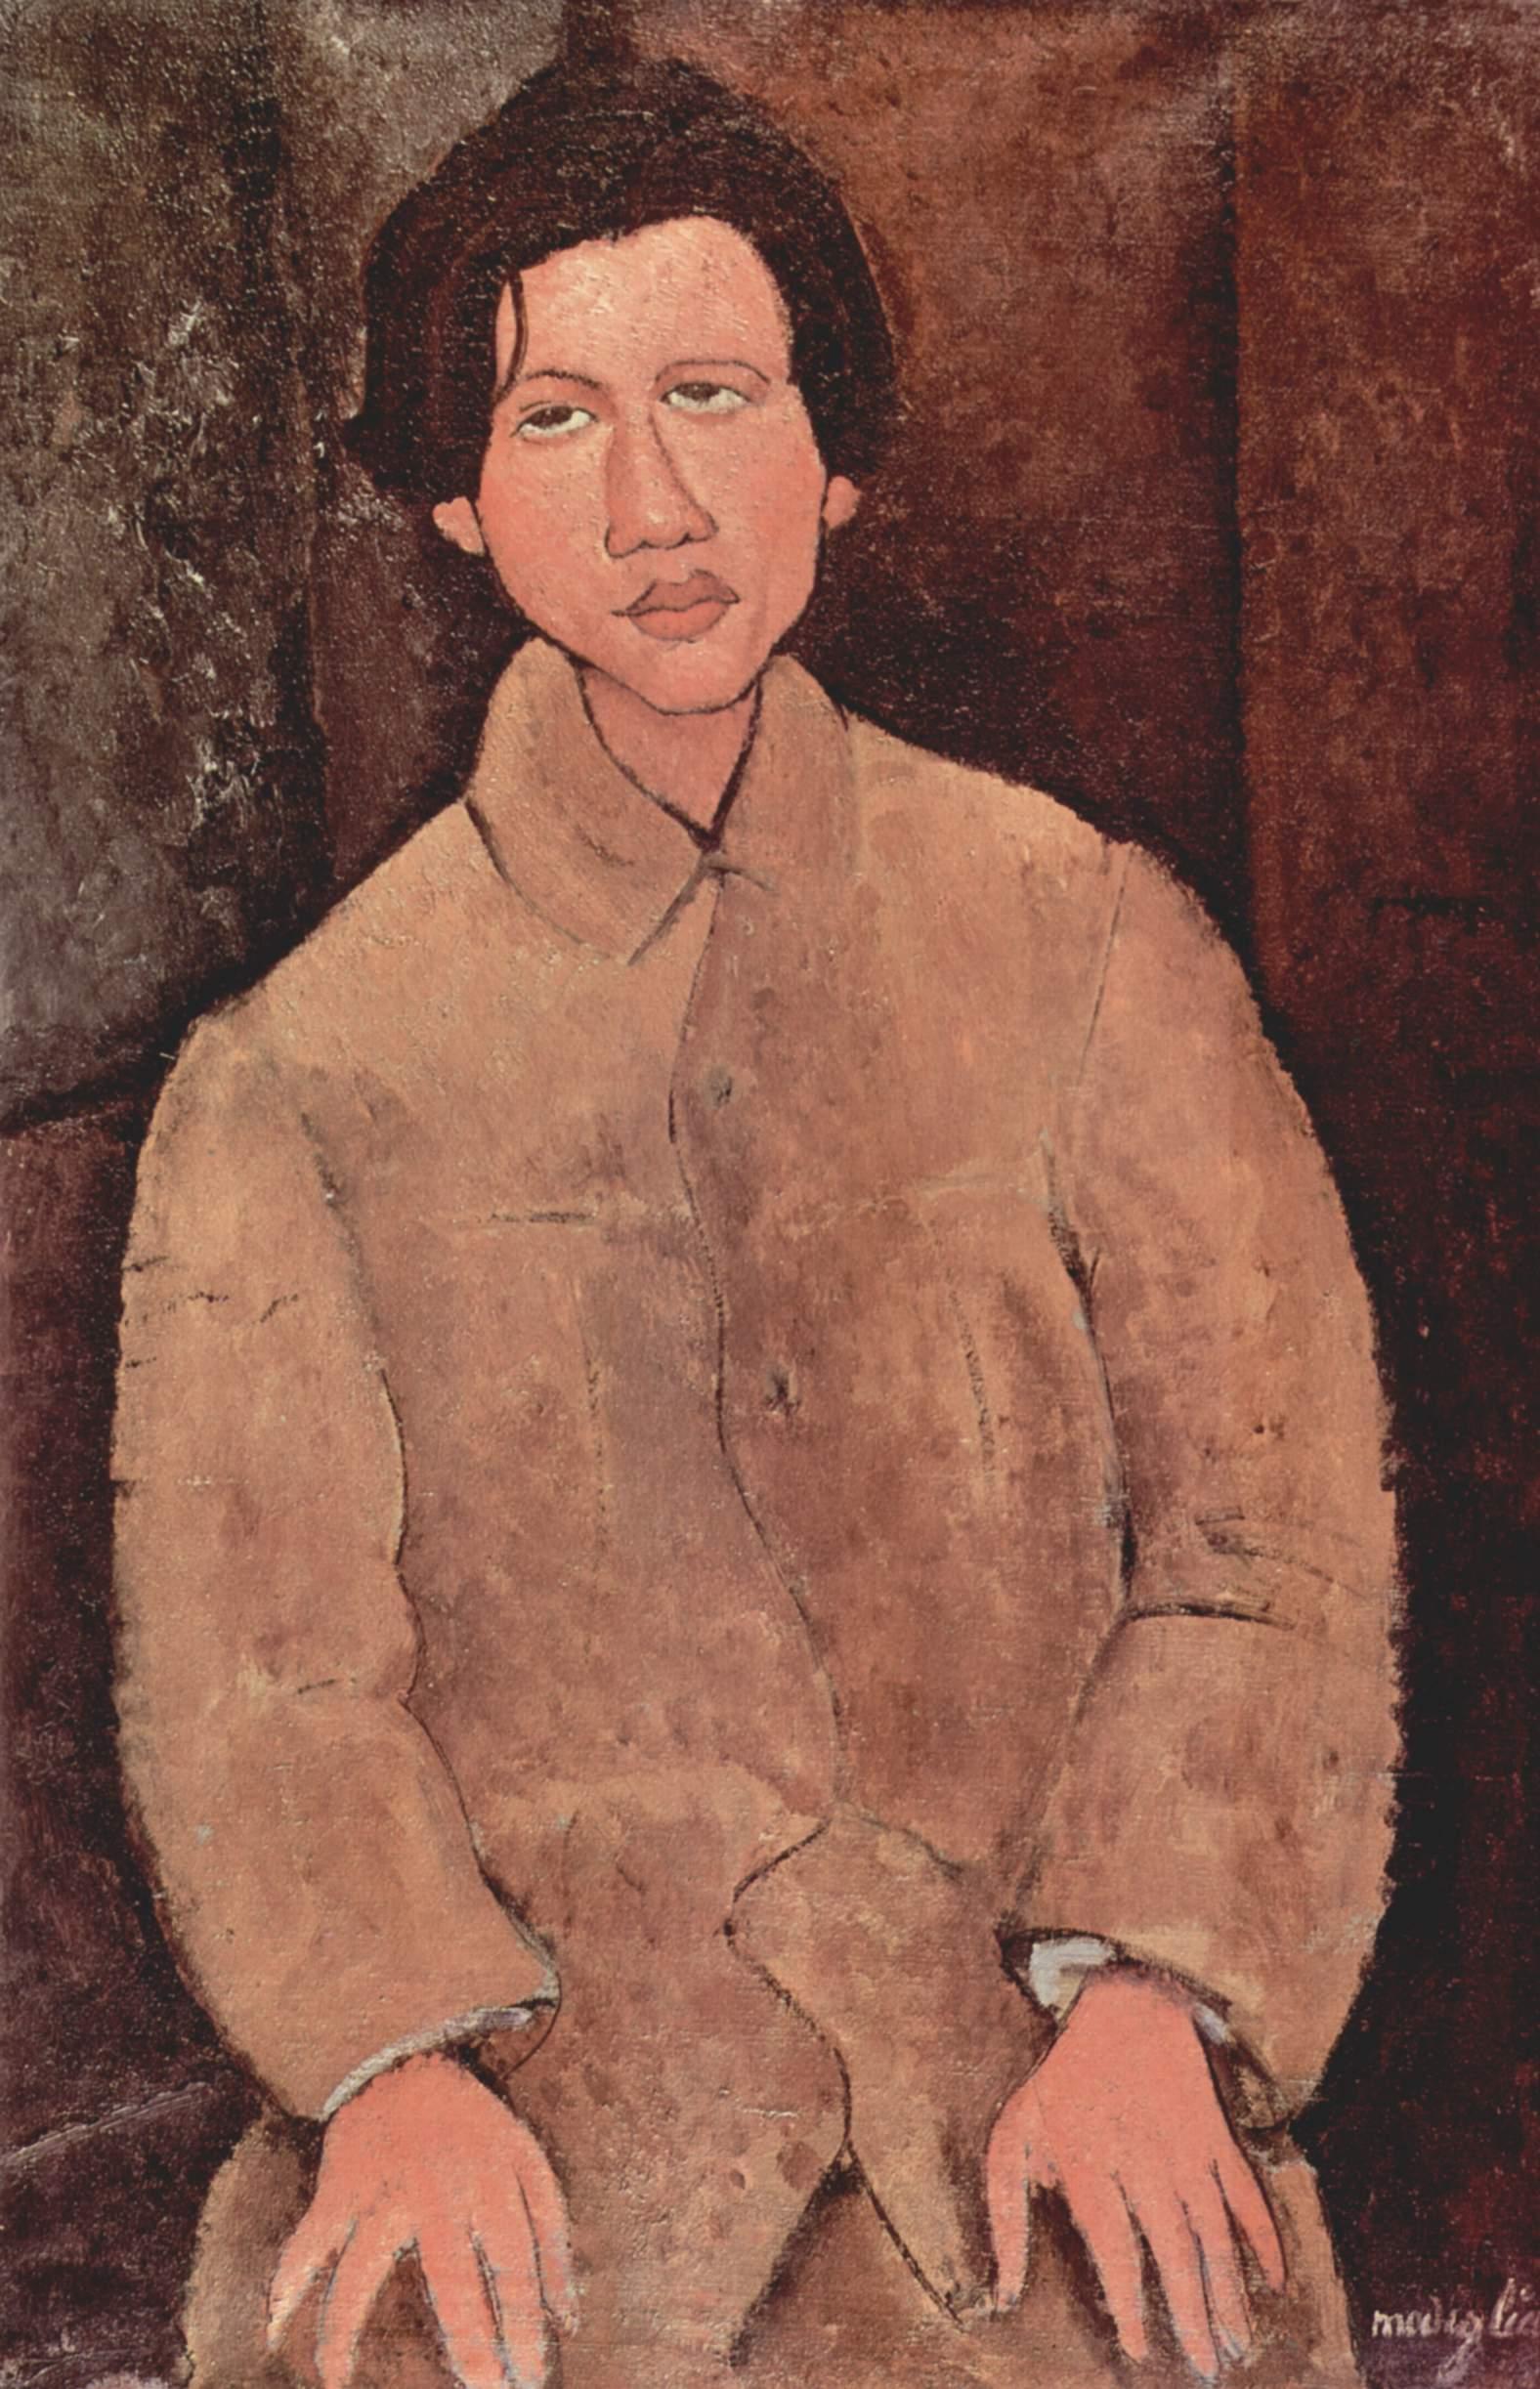 http://upload.wikimedia.org/wikipedia/commons/f/fe/Amadeo_Modigliani_036.jpg